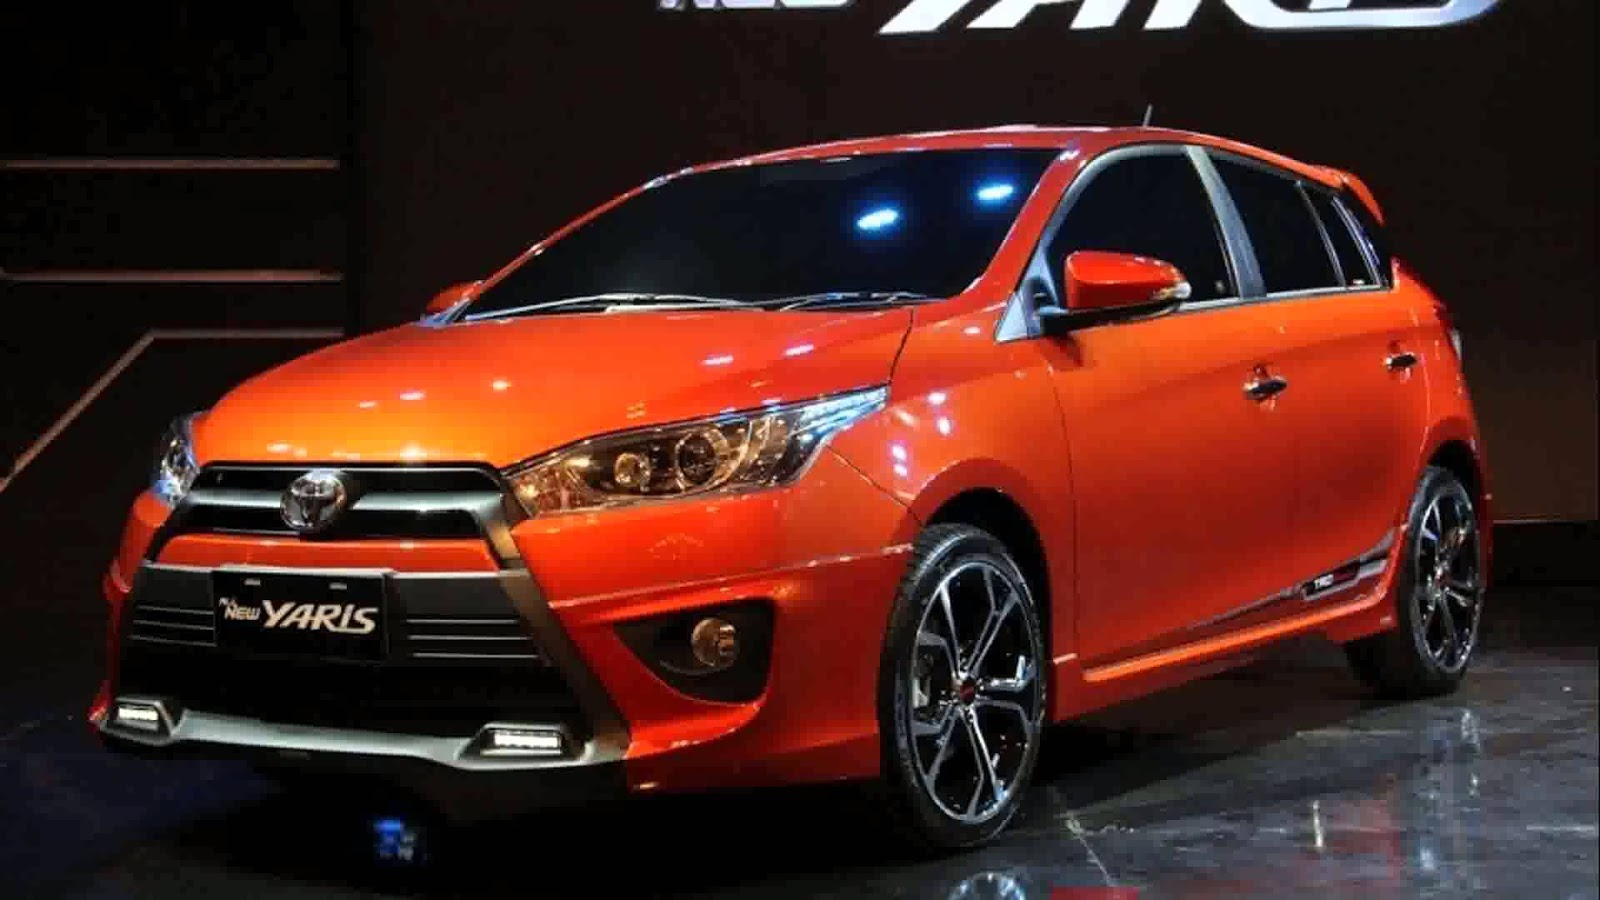 Harga New Yaris Trd 2018 Olx Grand Avanza 2016 Promo Kredit Toyota Bandung 2017